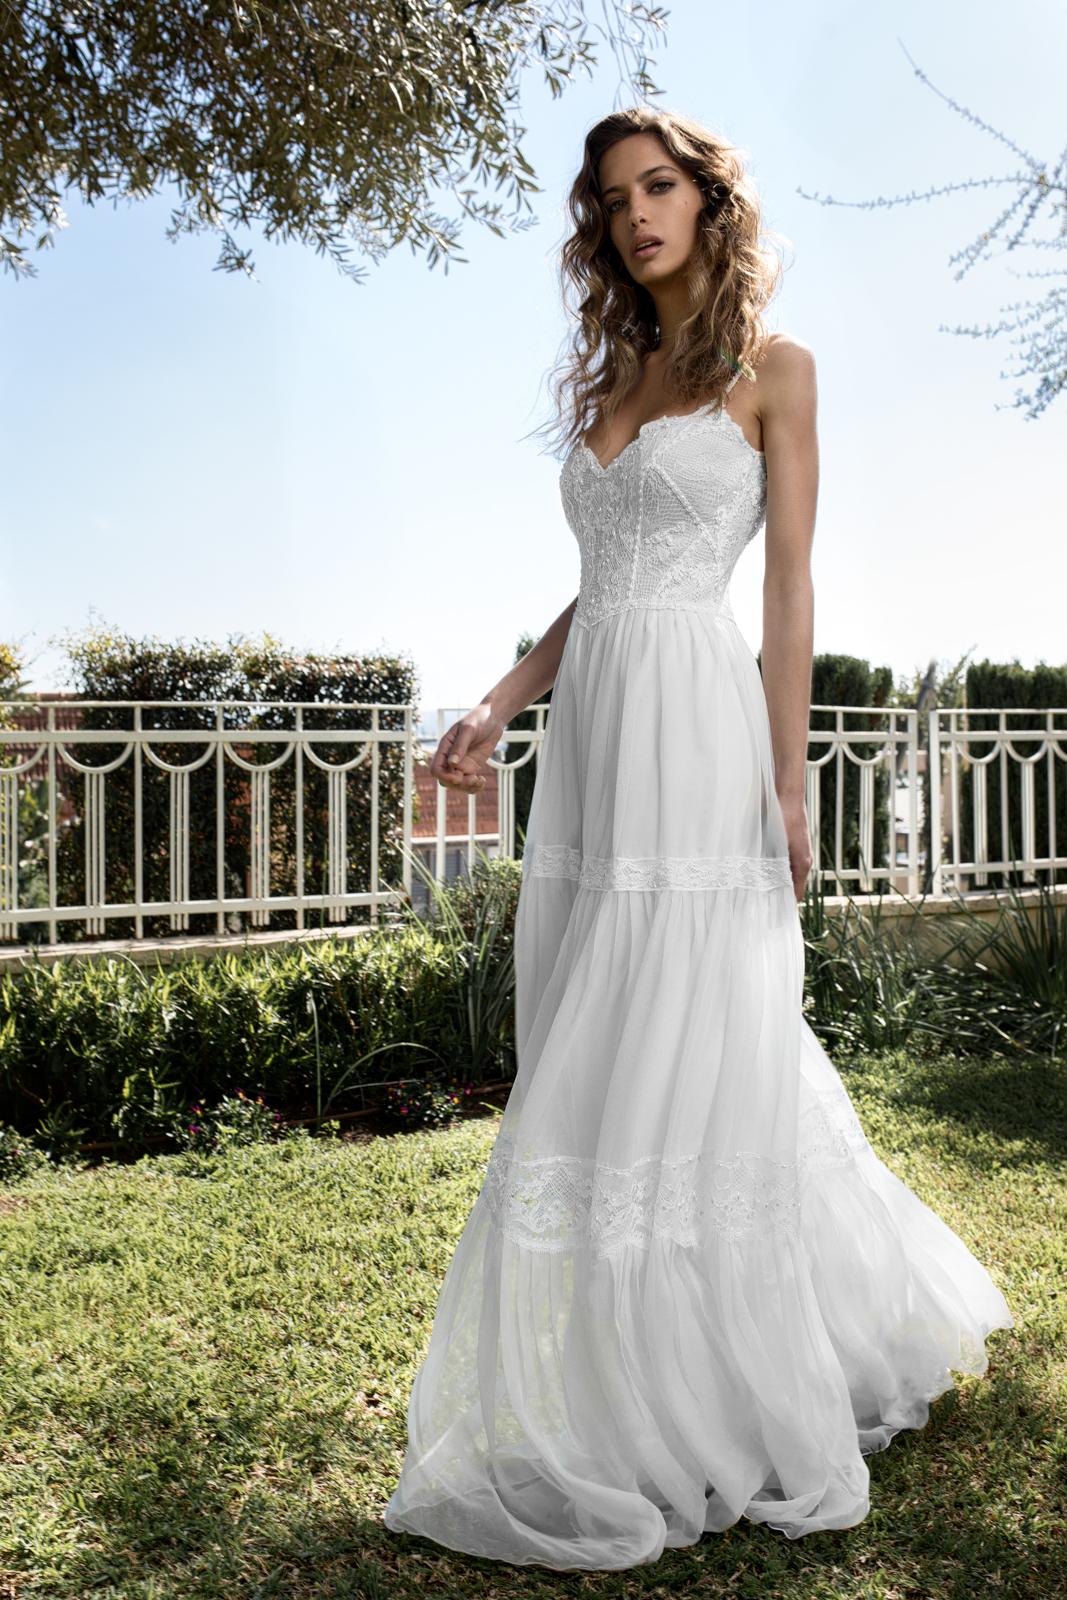 Shila wedding dress